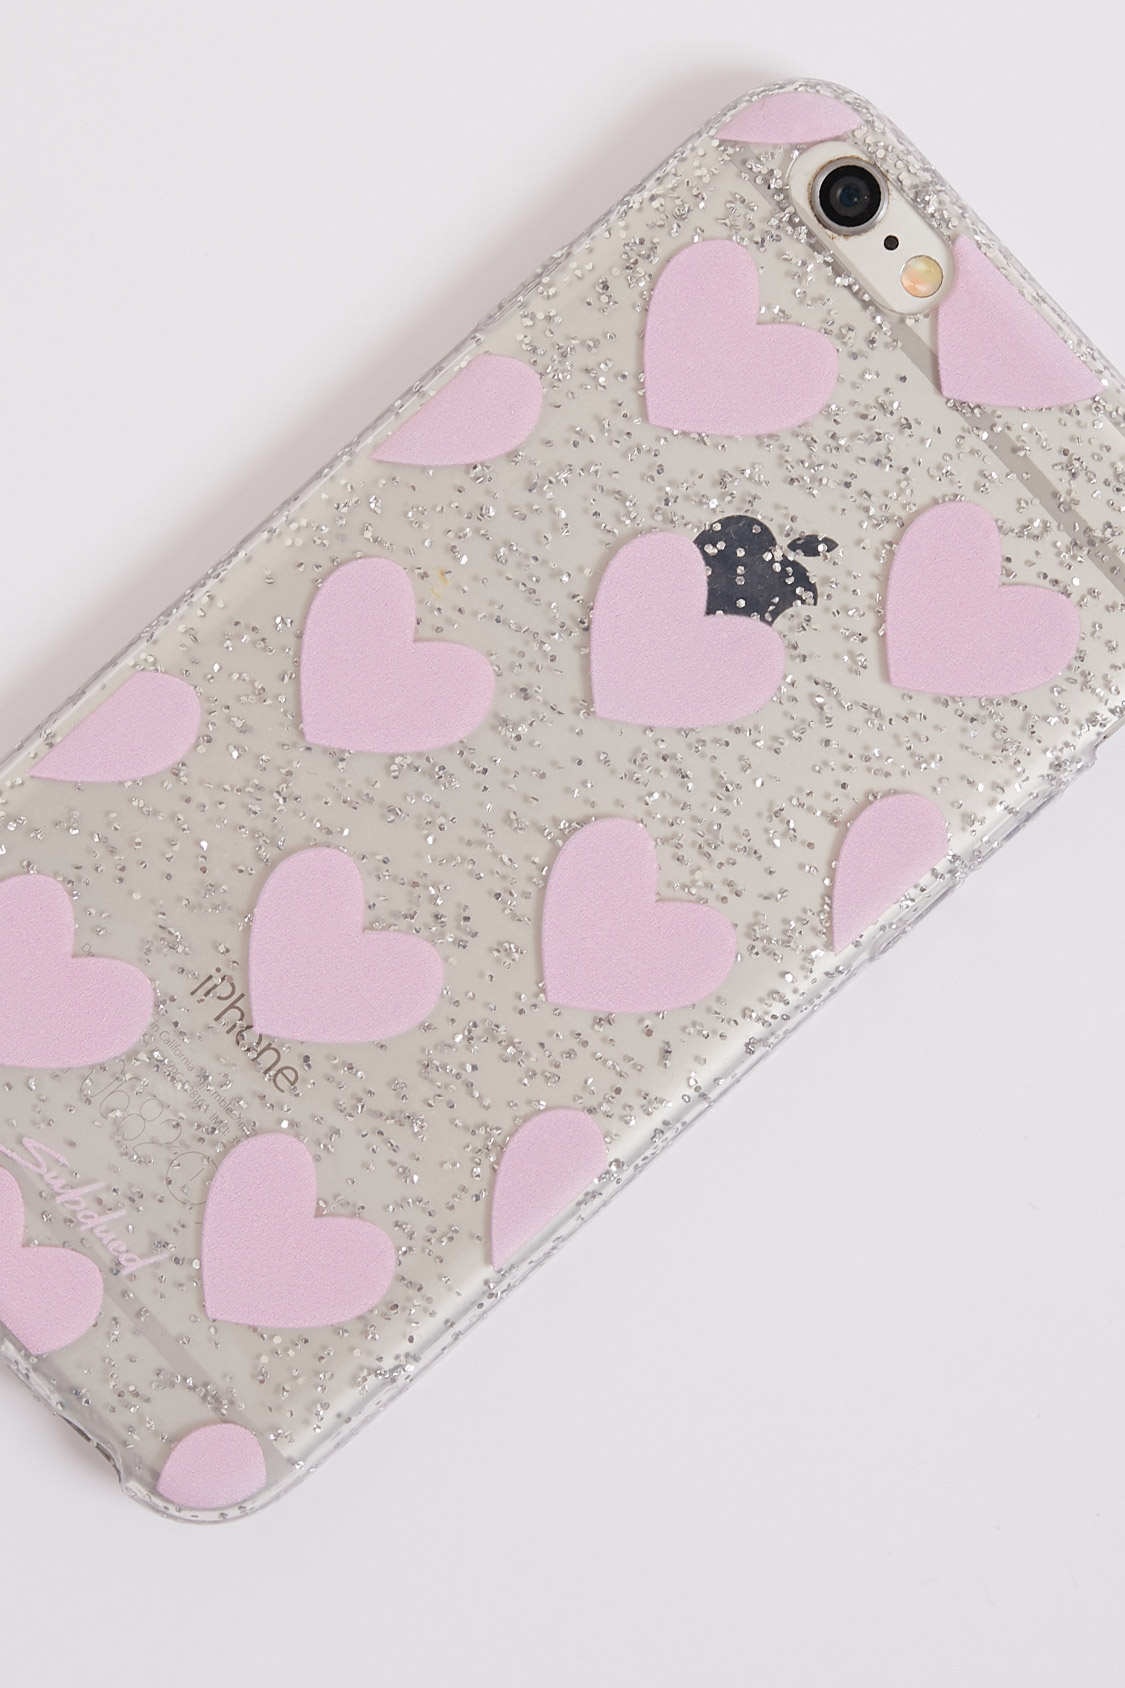 Hearts & glitter case - iPhone 6/6s